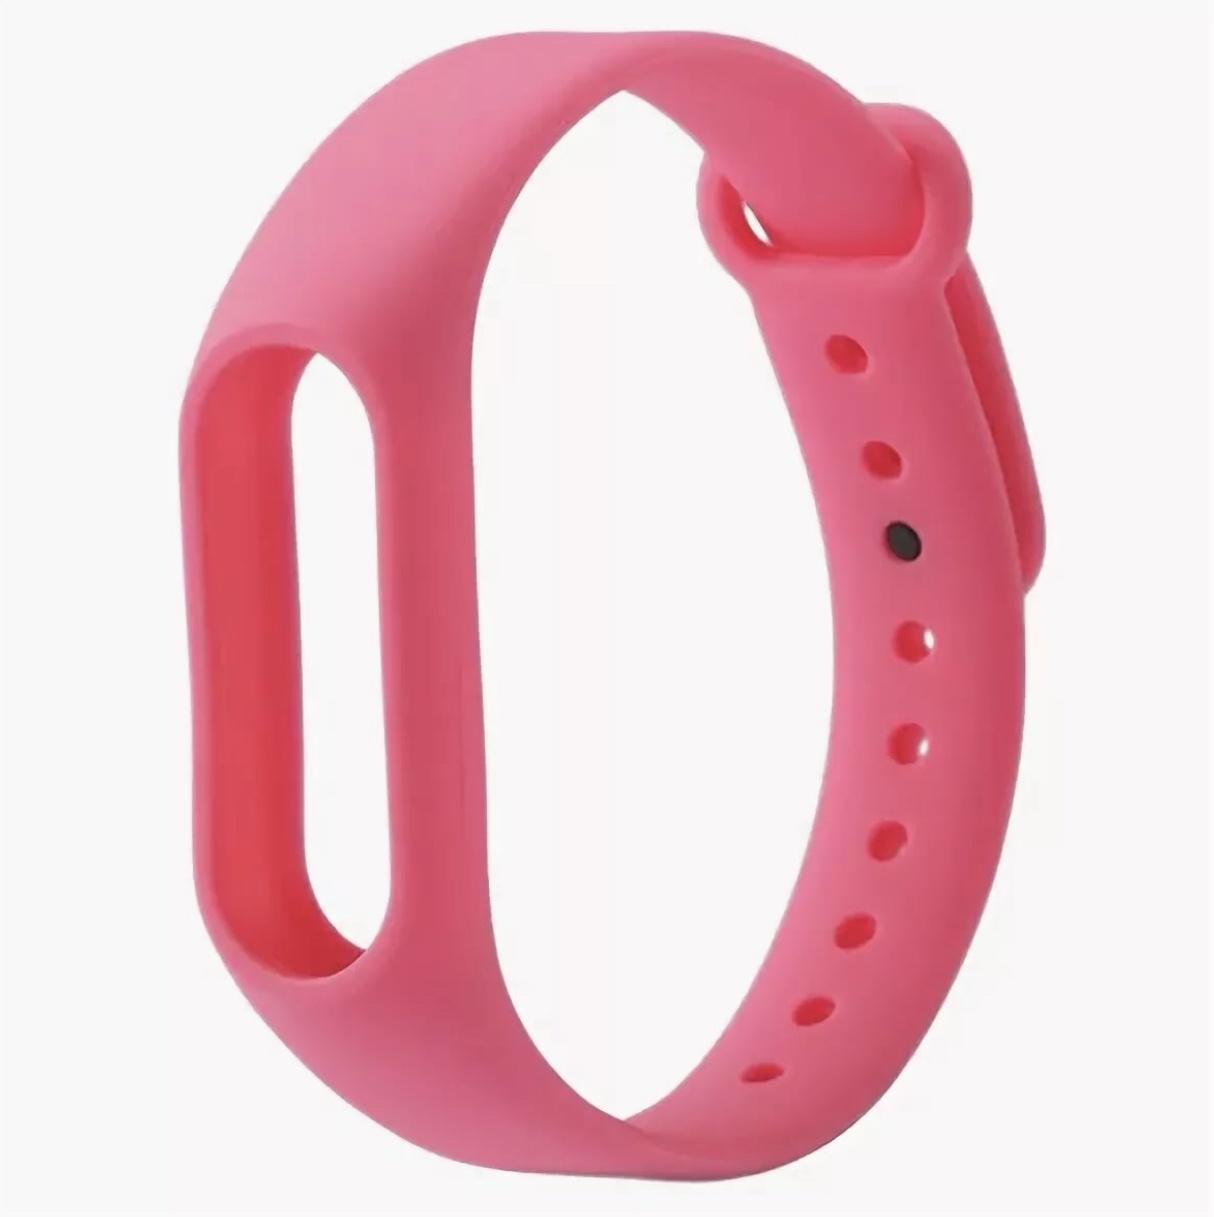 Ремешок для смарт-часов Markclub@Xiaomi Ремешок xiaomi mi band 3, mi band 3 розовый, розовый ремешок для смарт часов markclub xiaomi mi band 2 гепард